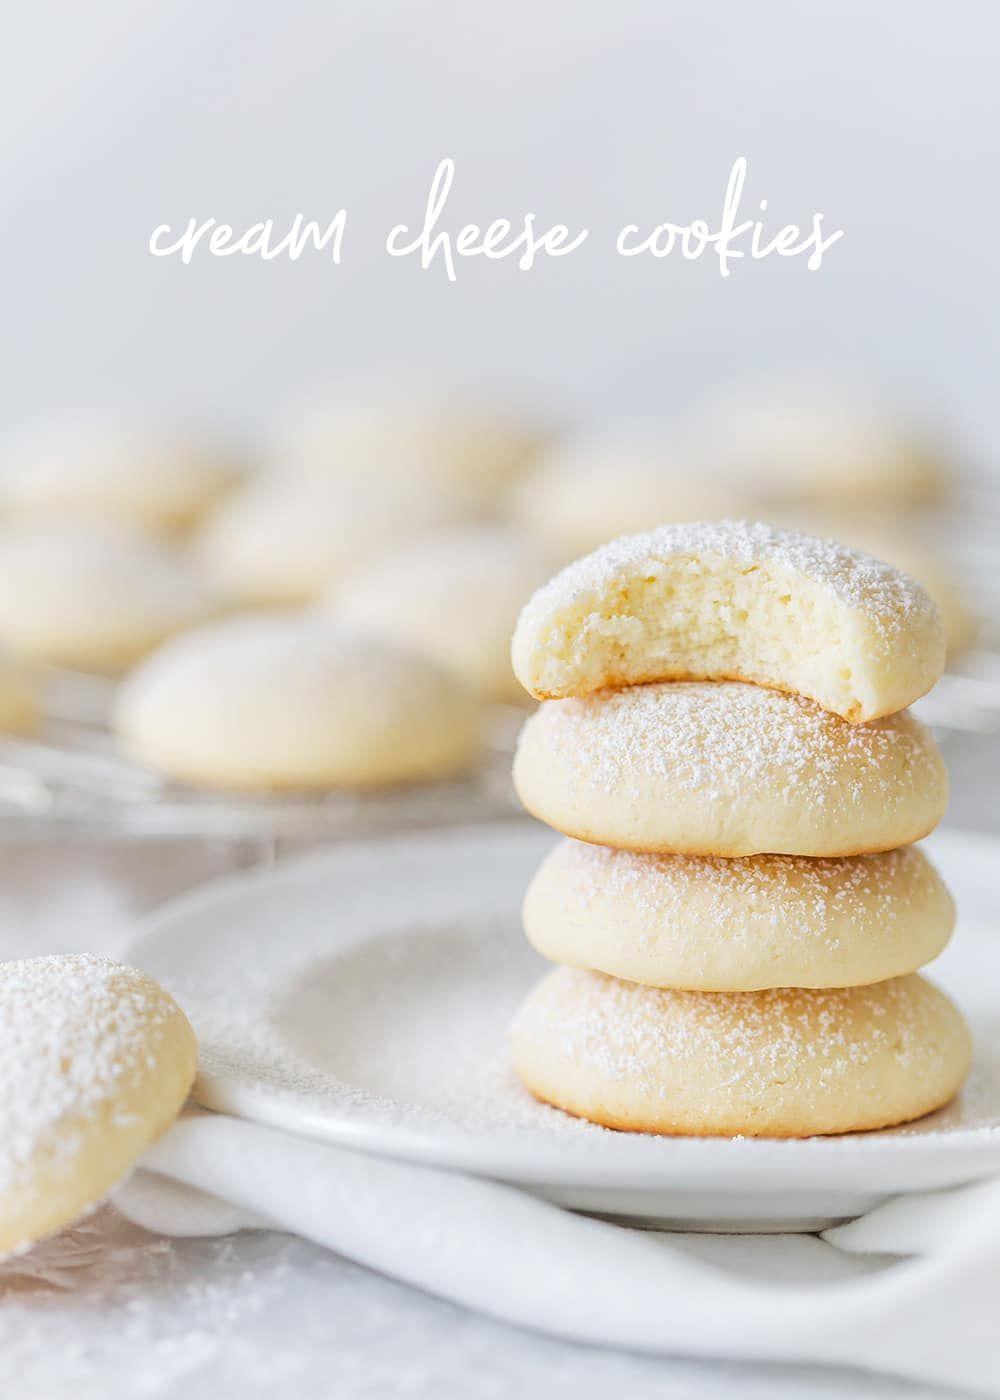 cream-cheese-cookies-recipe.jpg